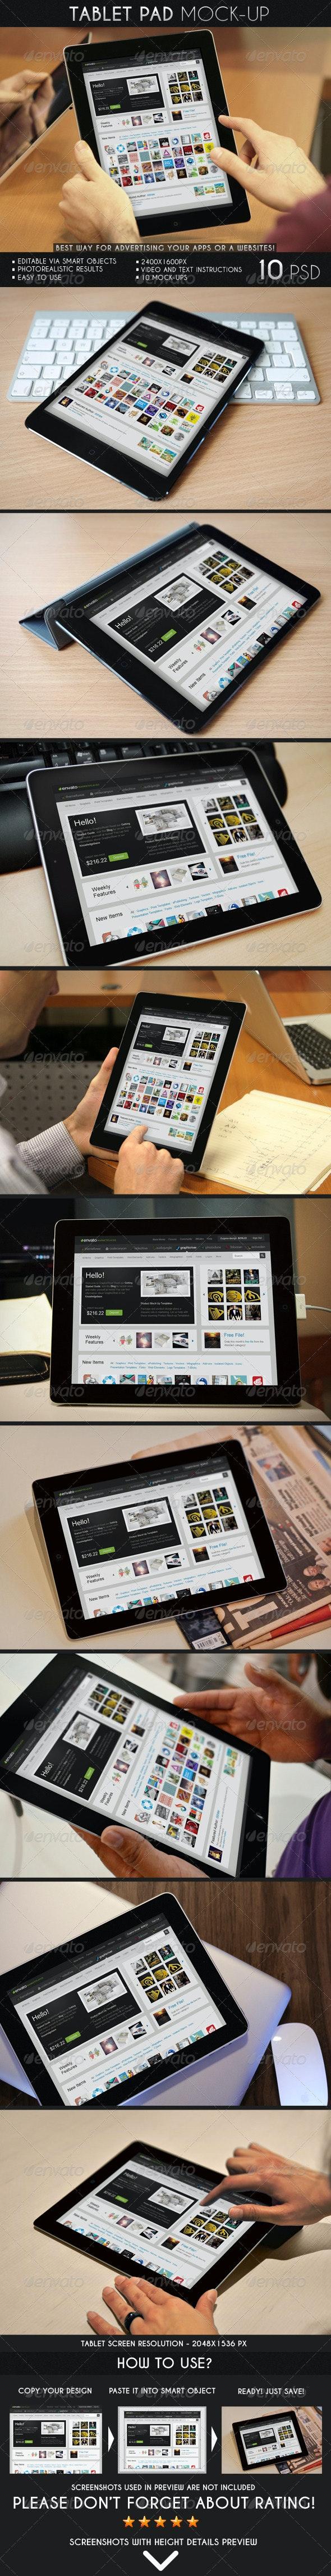 Tablet Pad Mock-Up - Mobile Displays